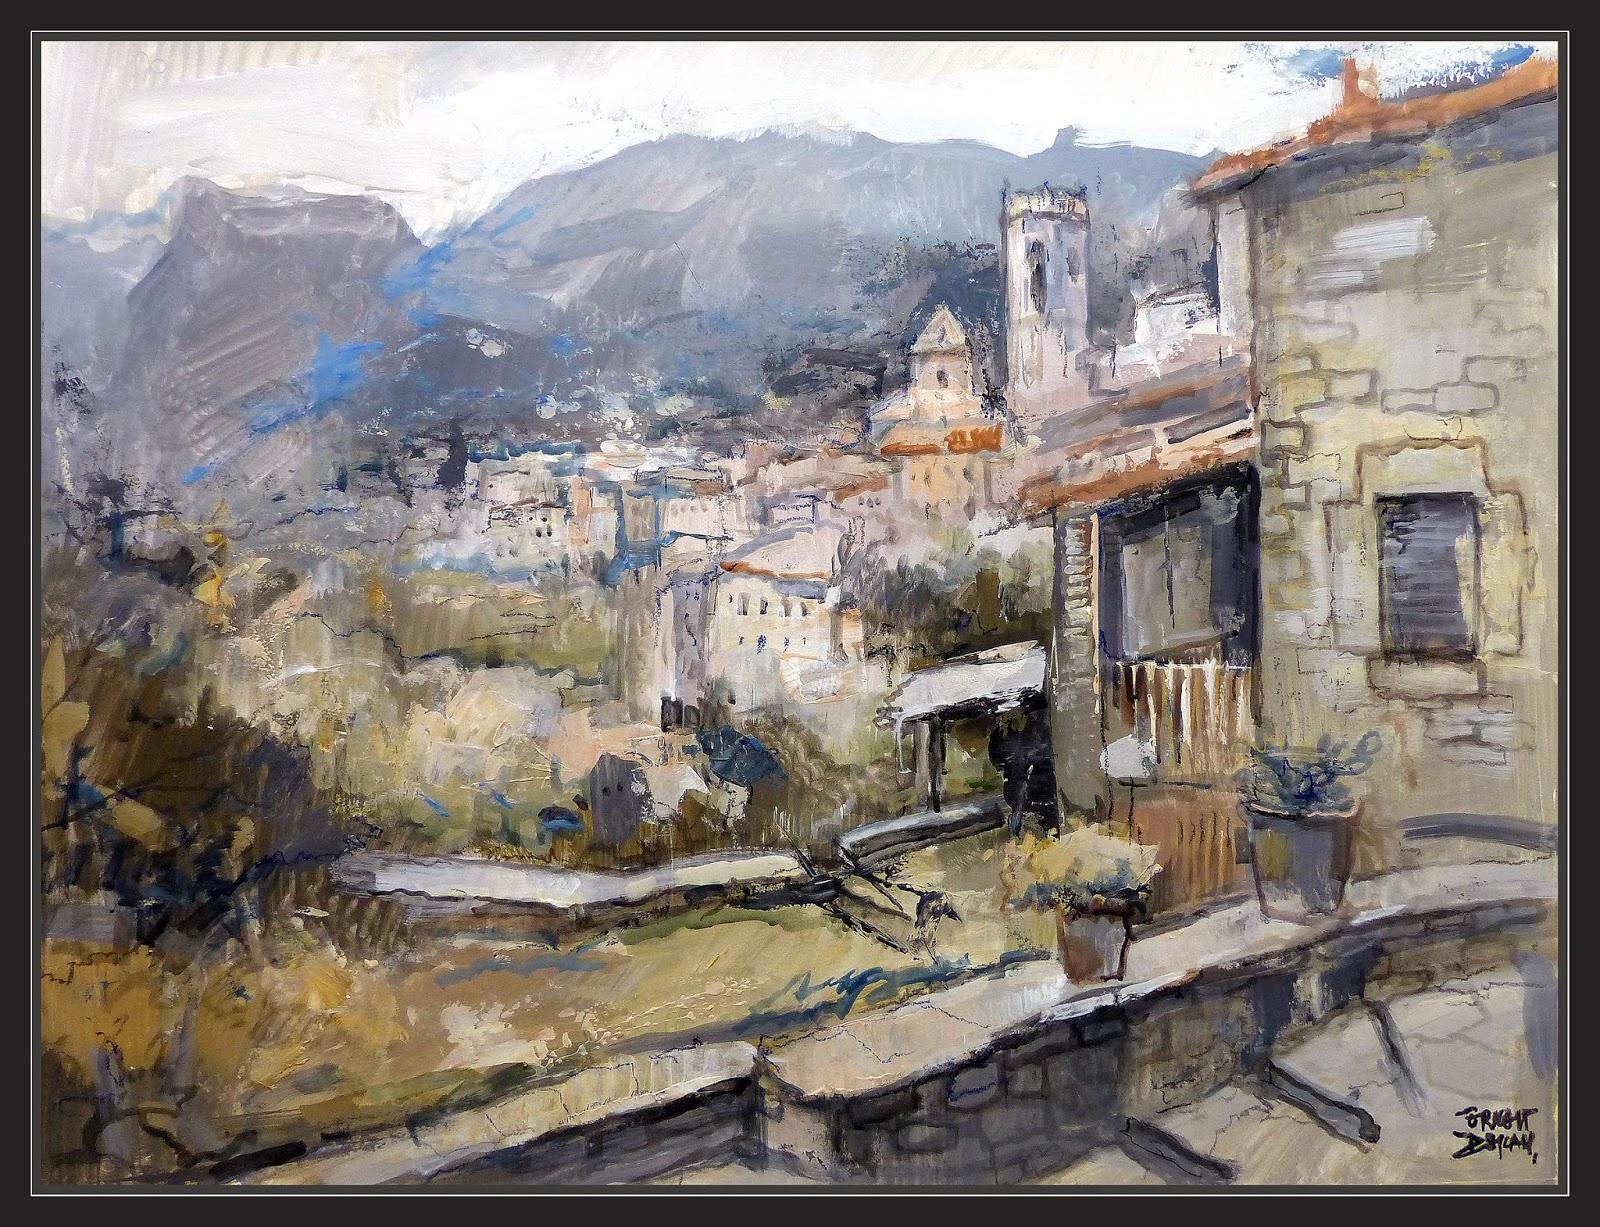 Ernest descals artista pintor - Trabajo de pintor en barcelona ...